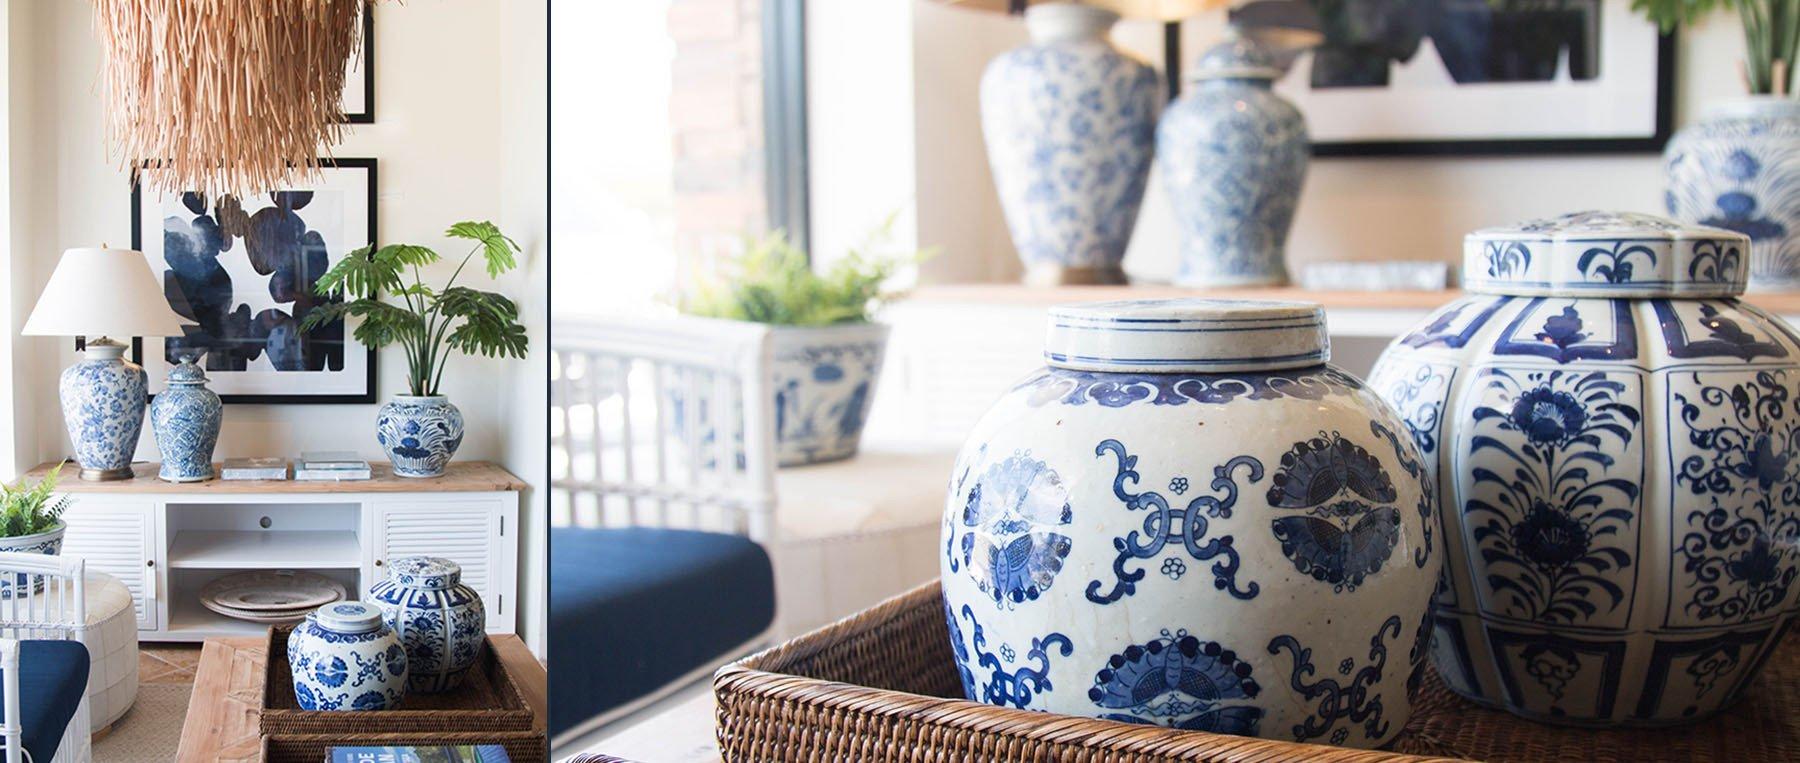 In the Spotlight: Biku Furniture and Homewares